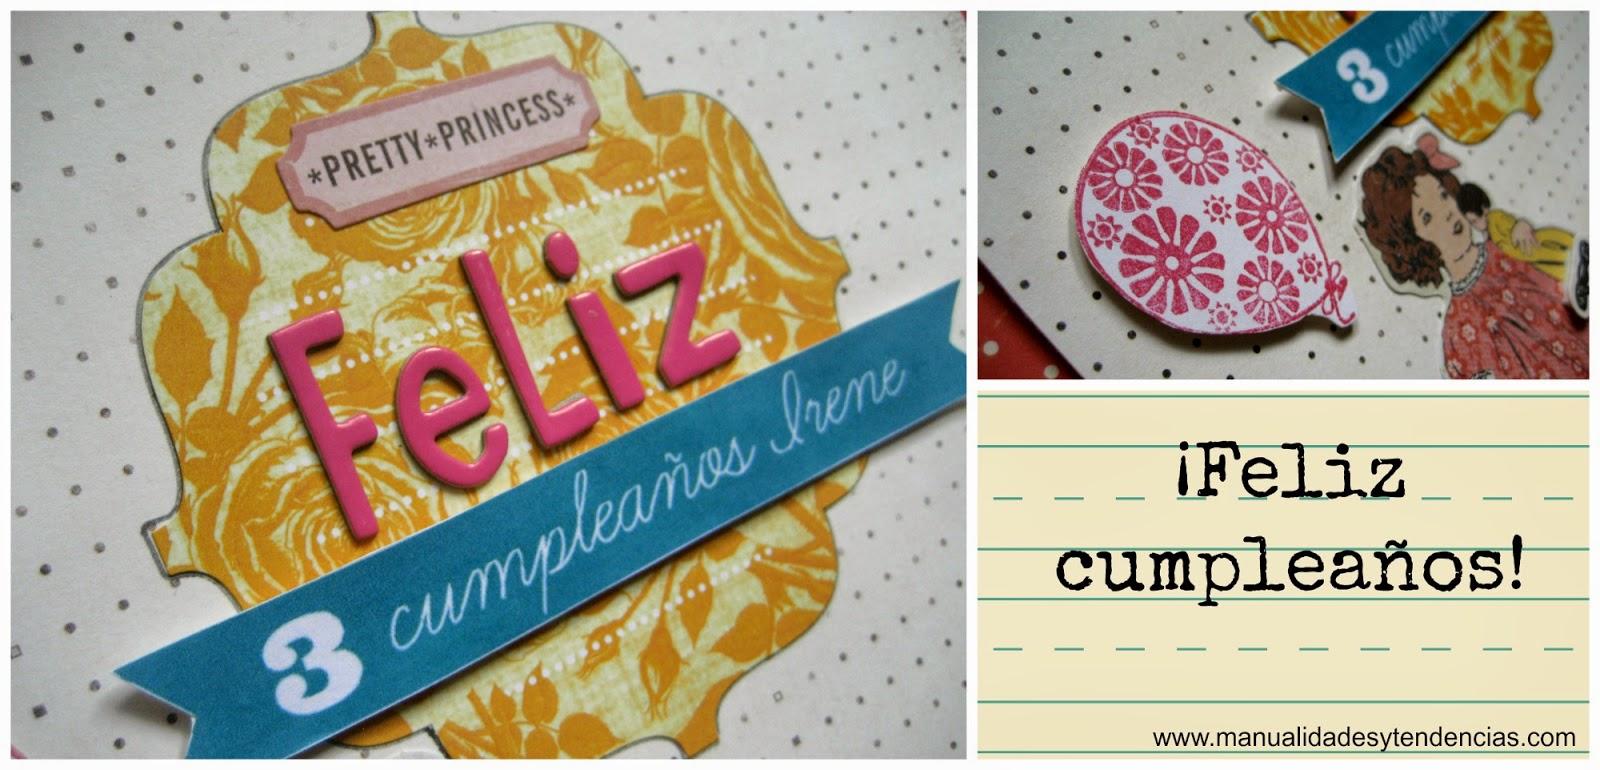 Tarjeta de cumpleaños para niña / Birthday card for a girl